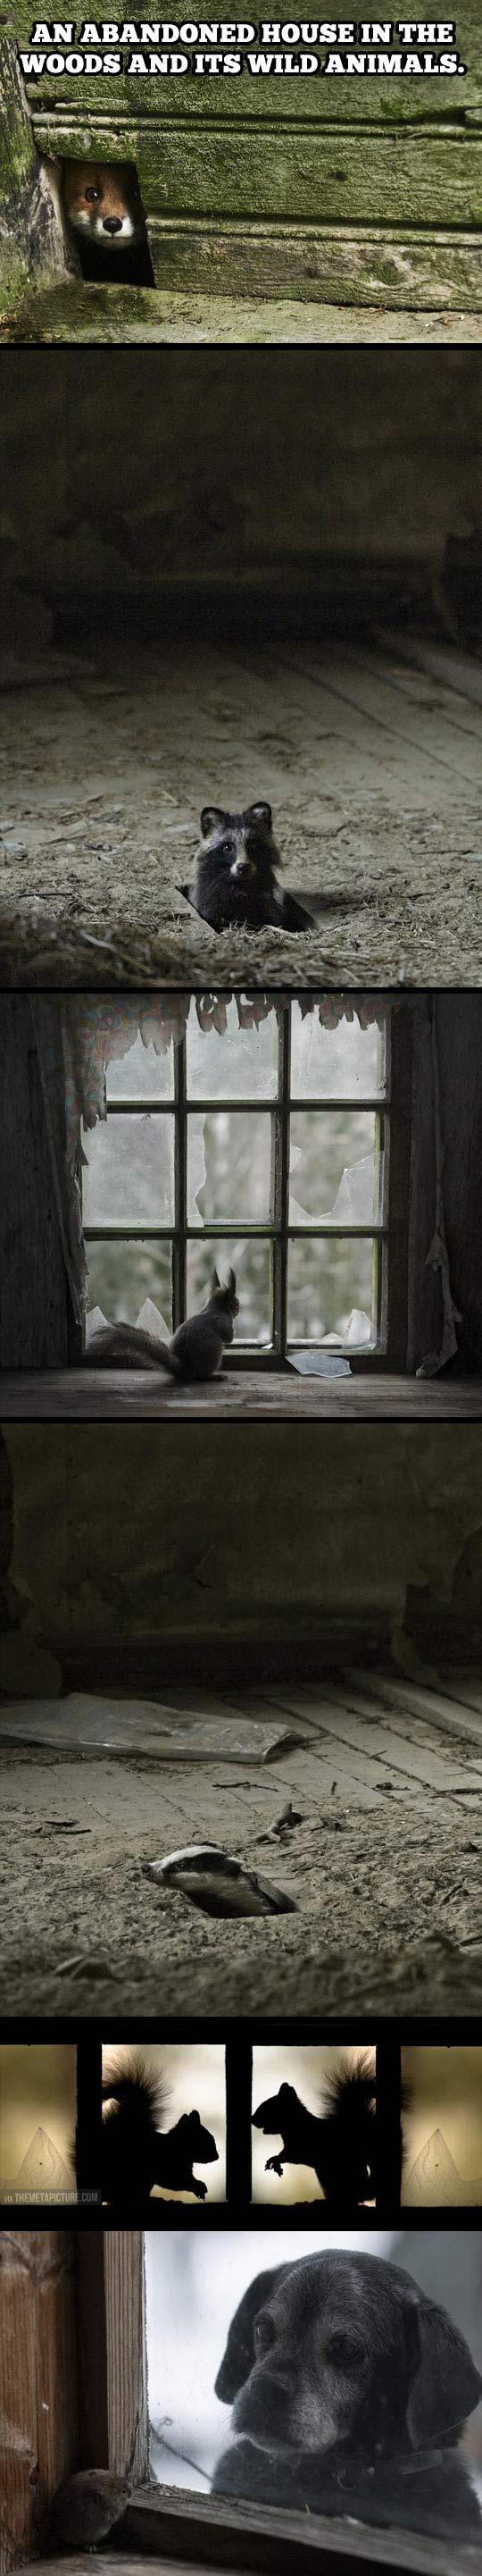 Abandoned house full of life…